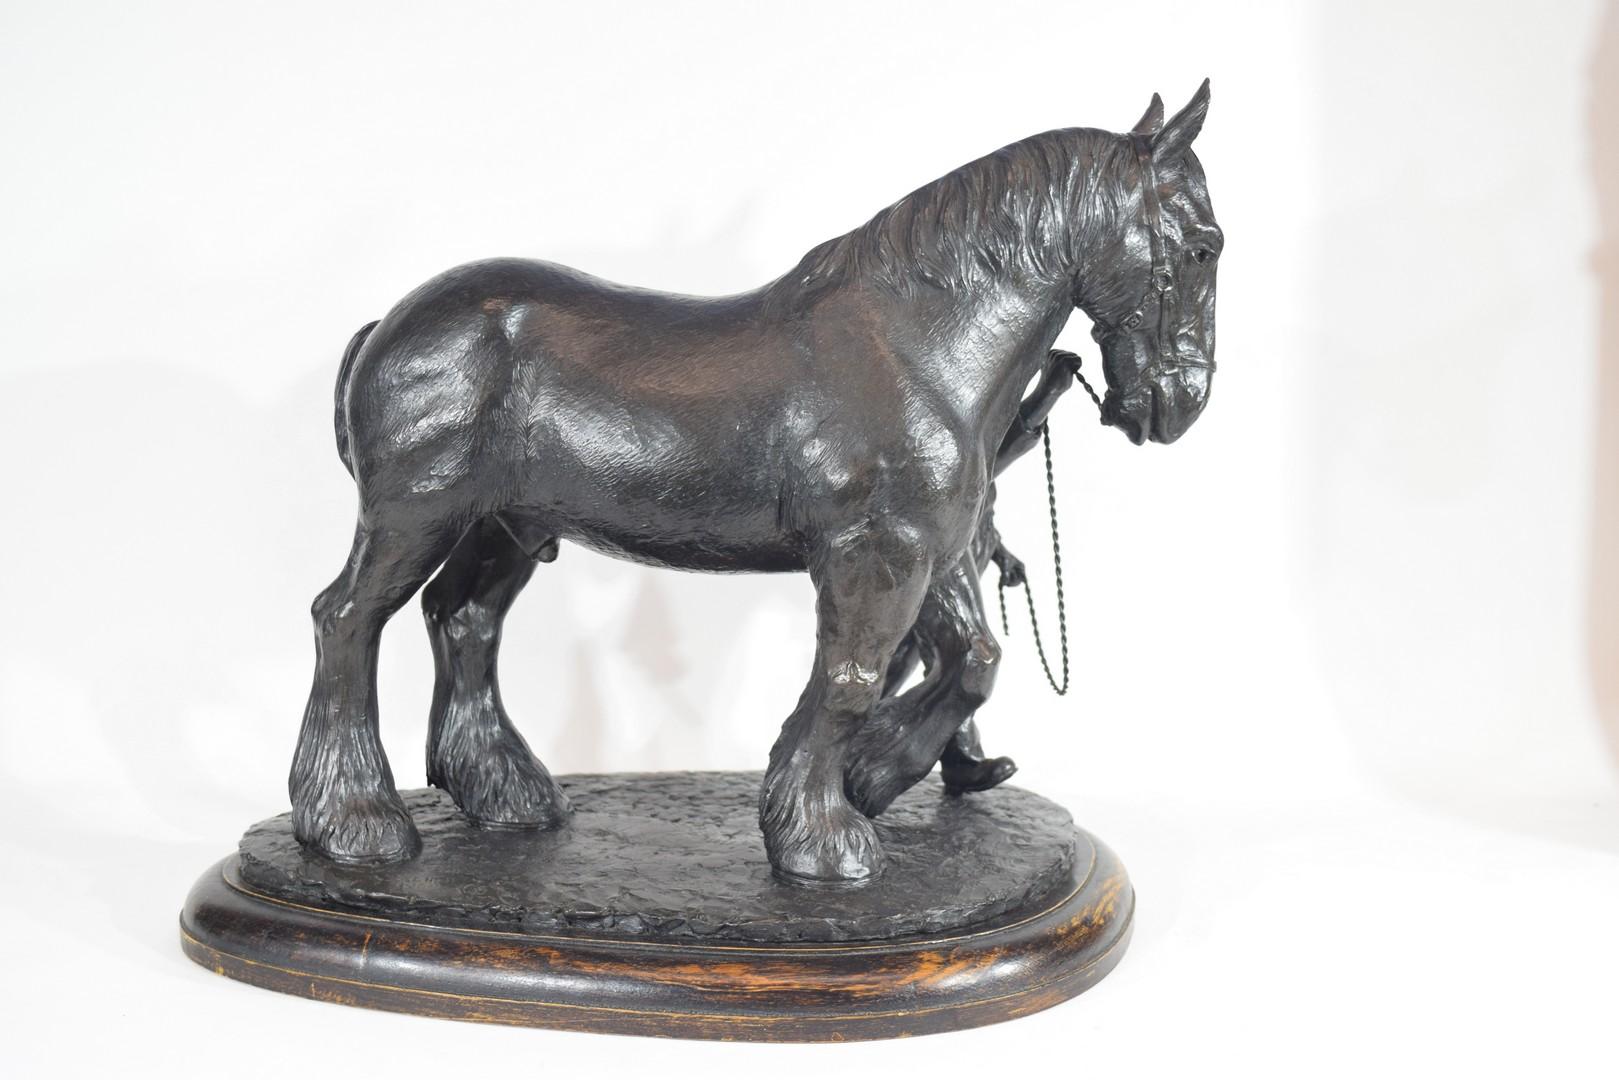 Brian Elton, bronzed resin figure 'The Ploughman' - Image 4 of 5